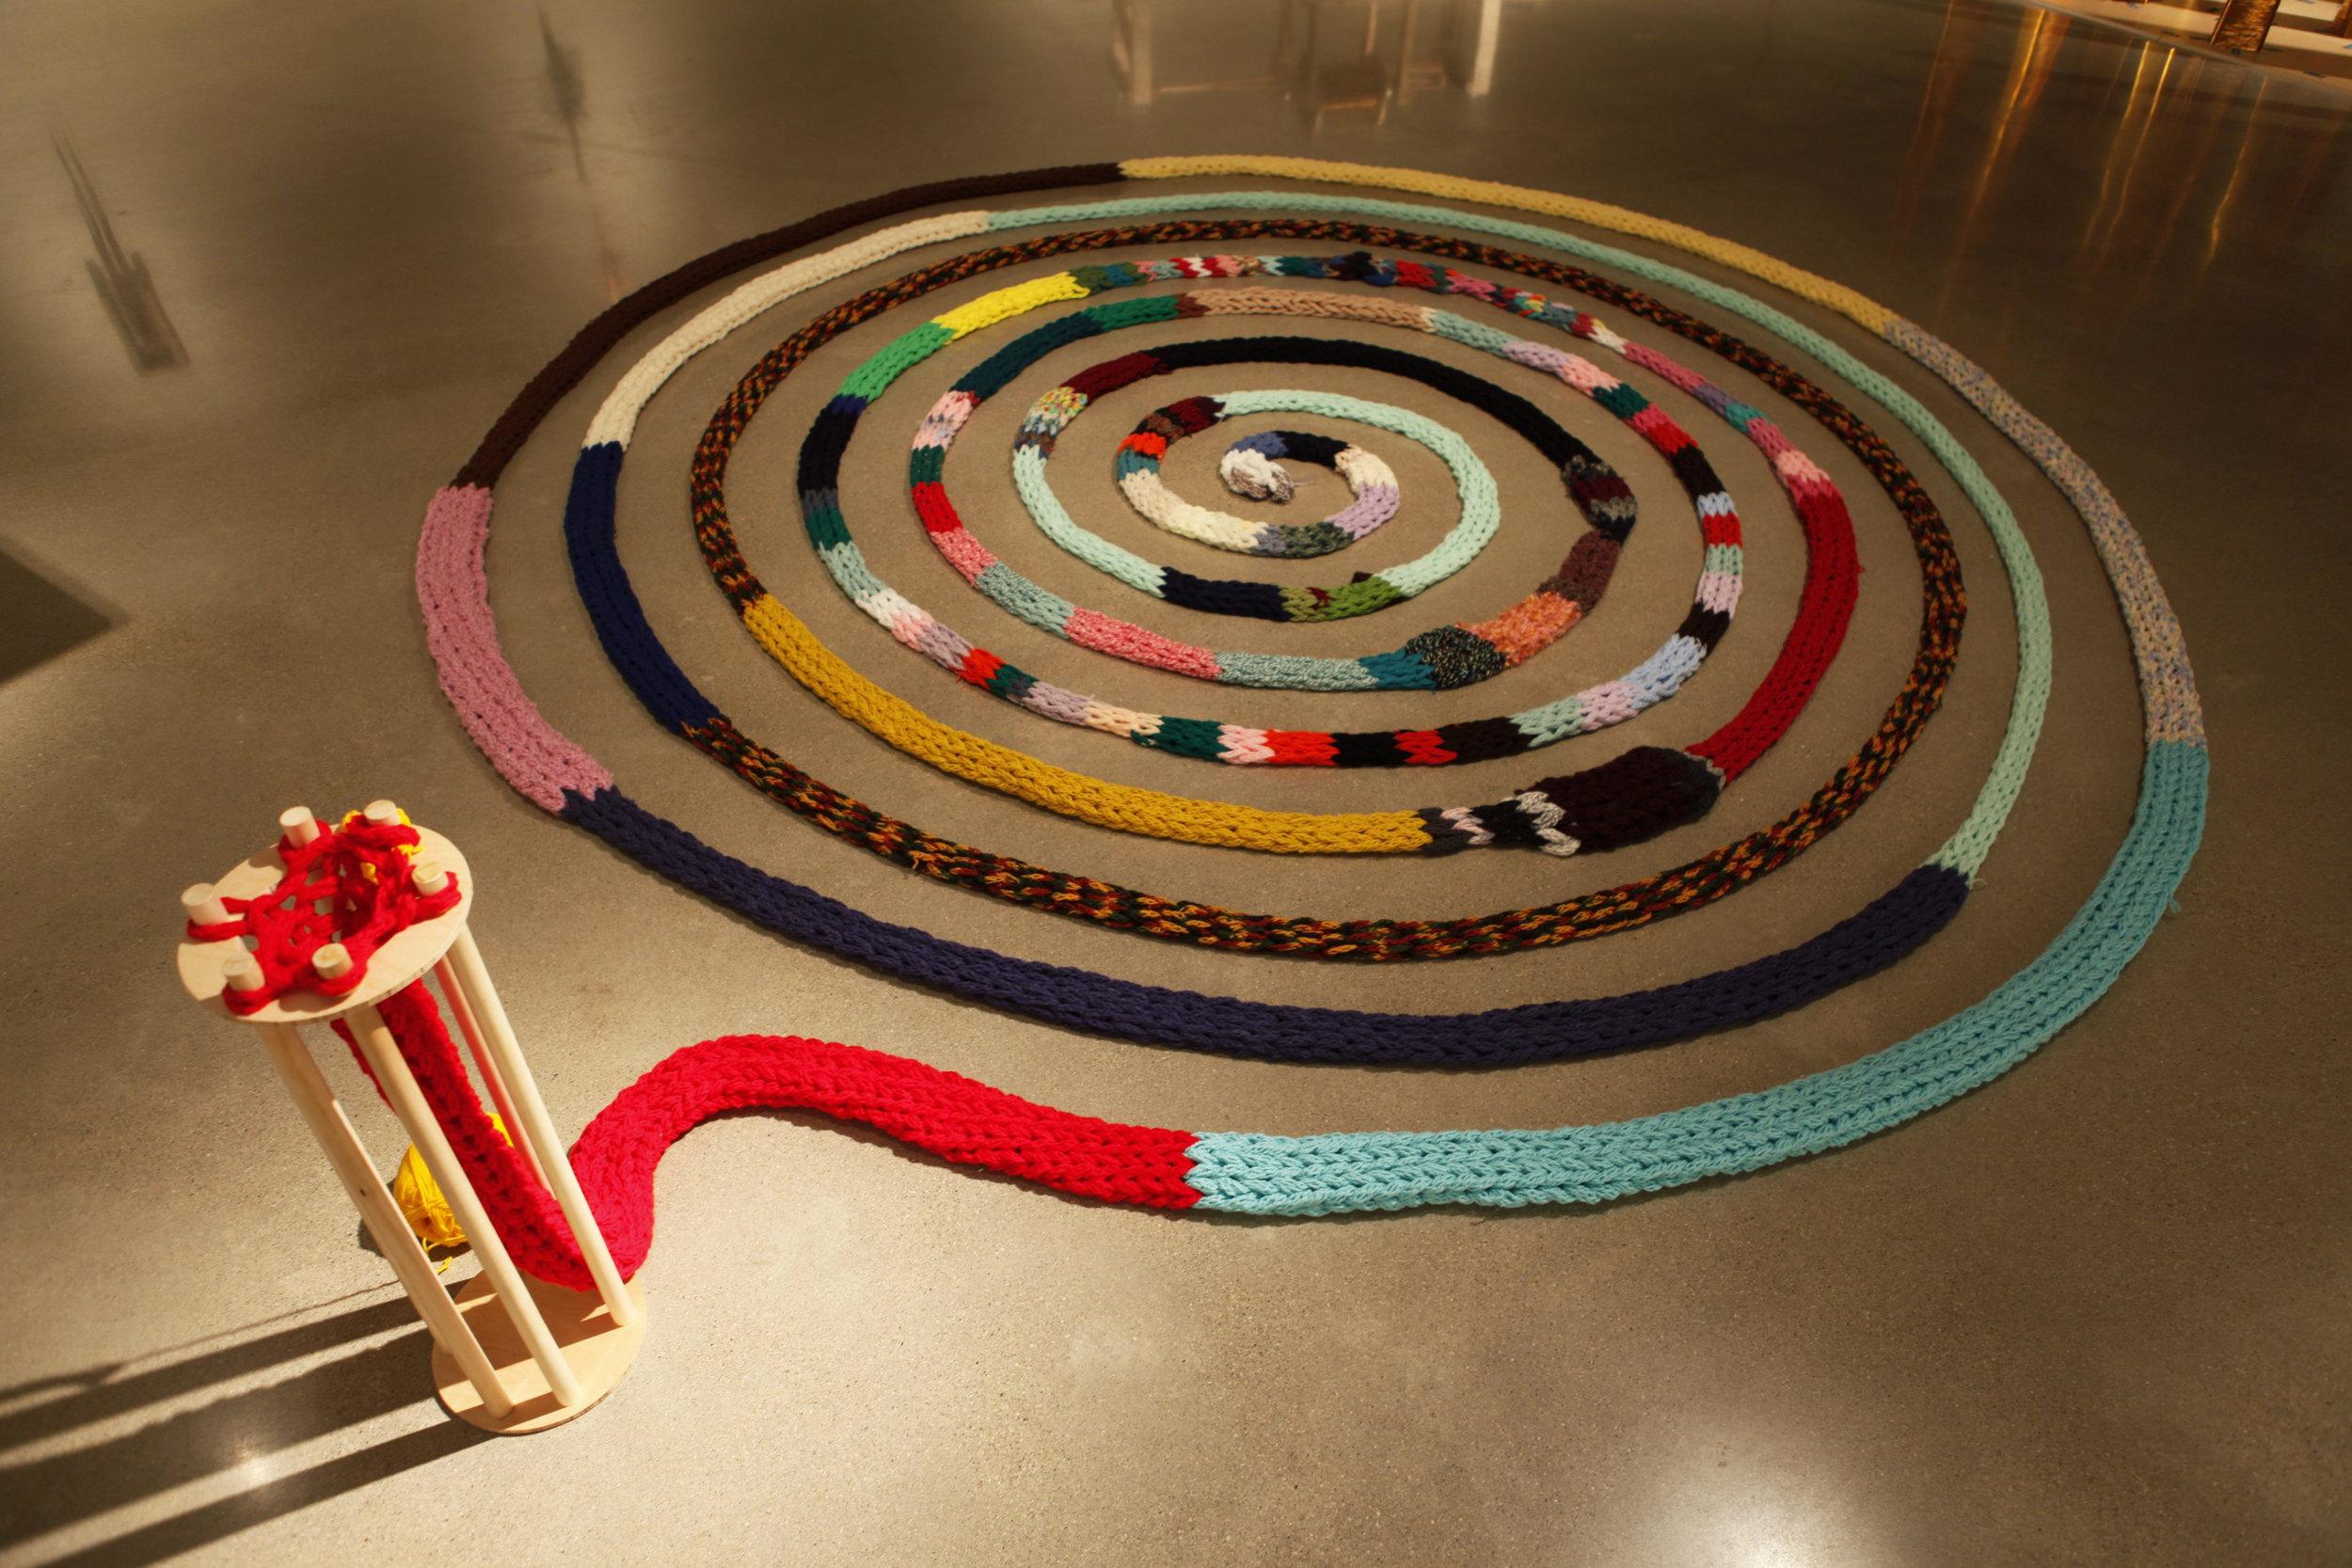 The Machine: Knitting Ouroboros,  Yarn, Wood, Mallory Donen, 2017